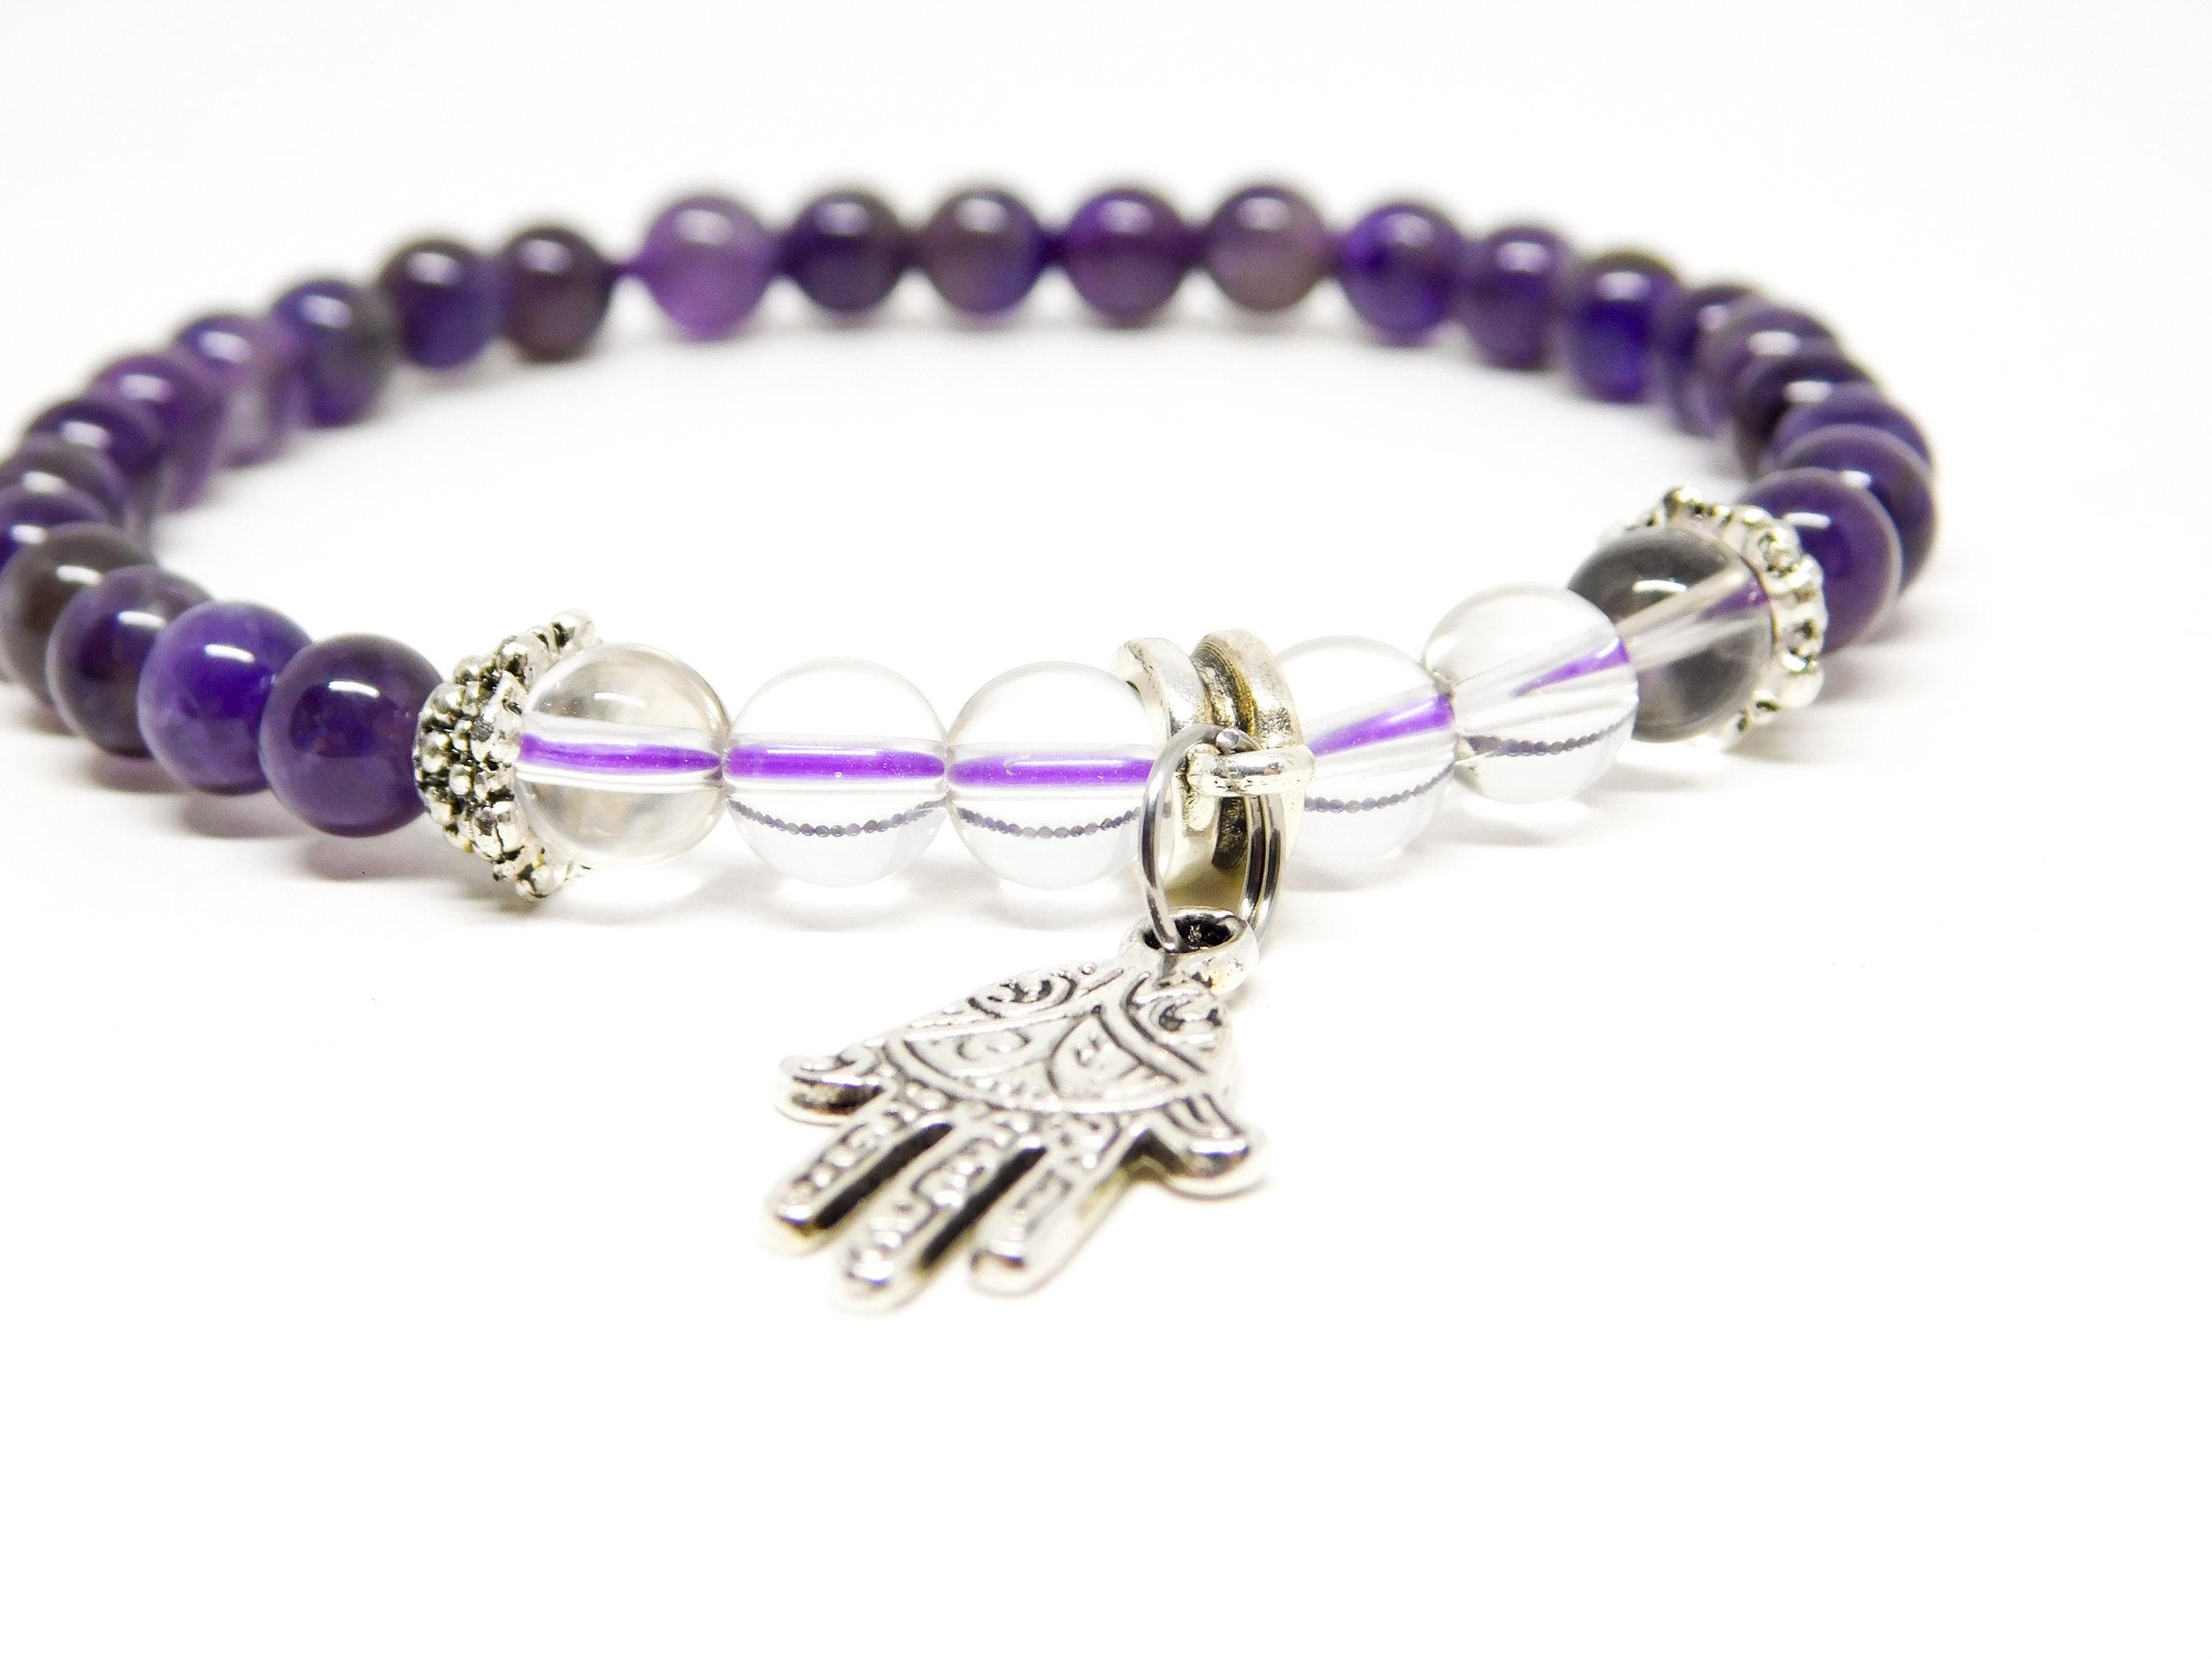 Spiritual Protection Wrist Mala - dark